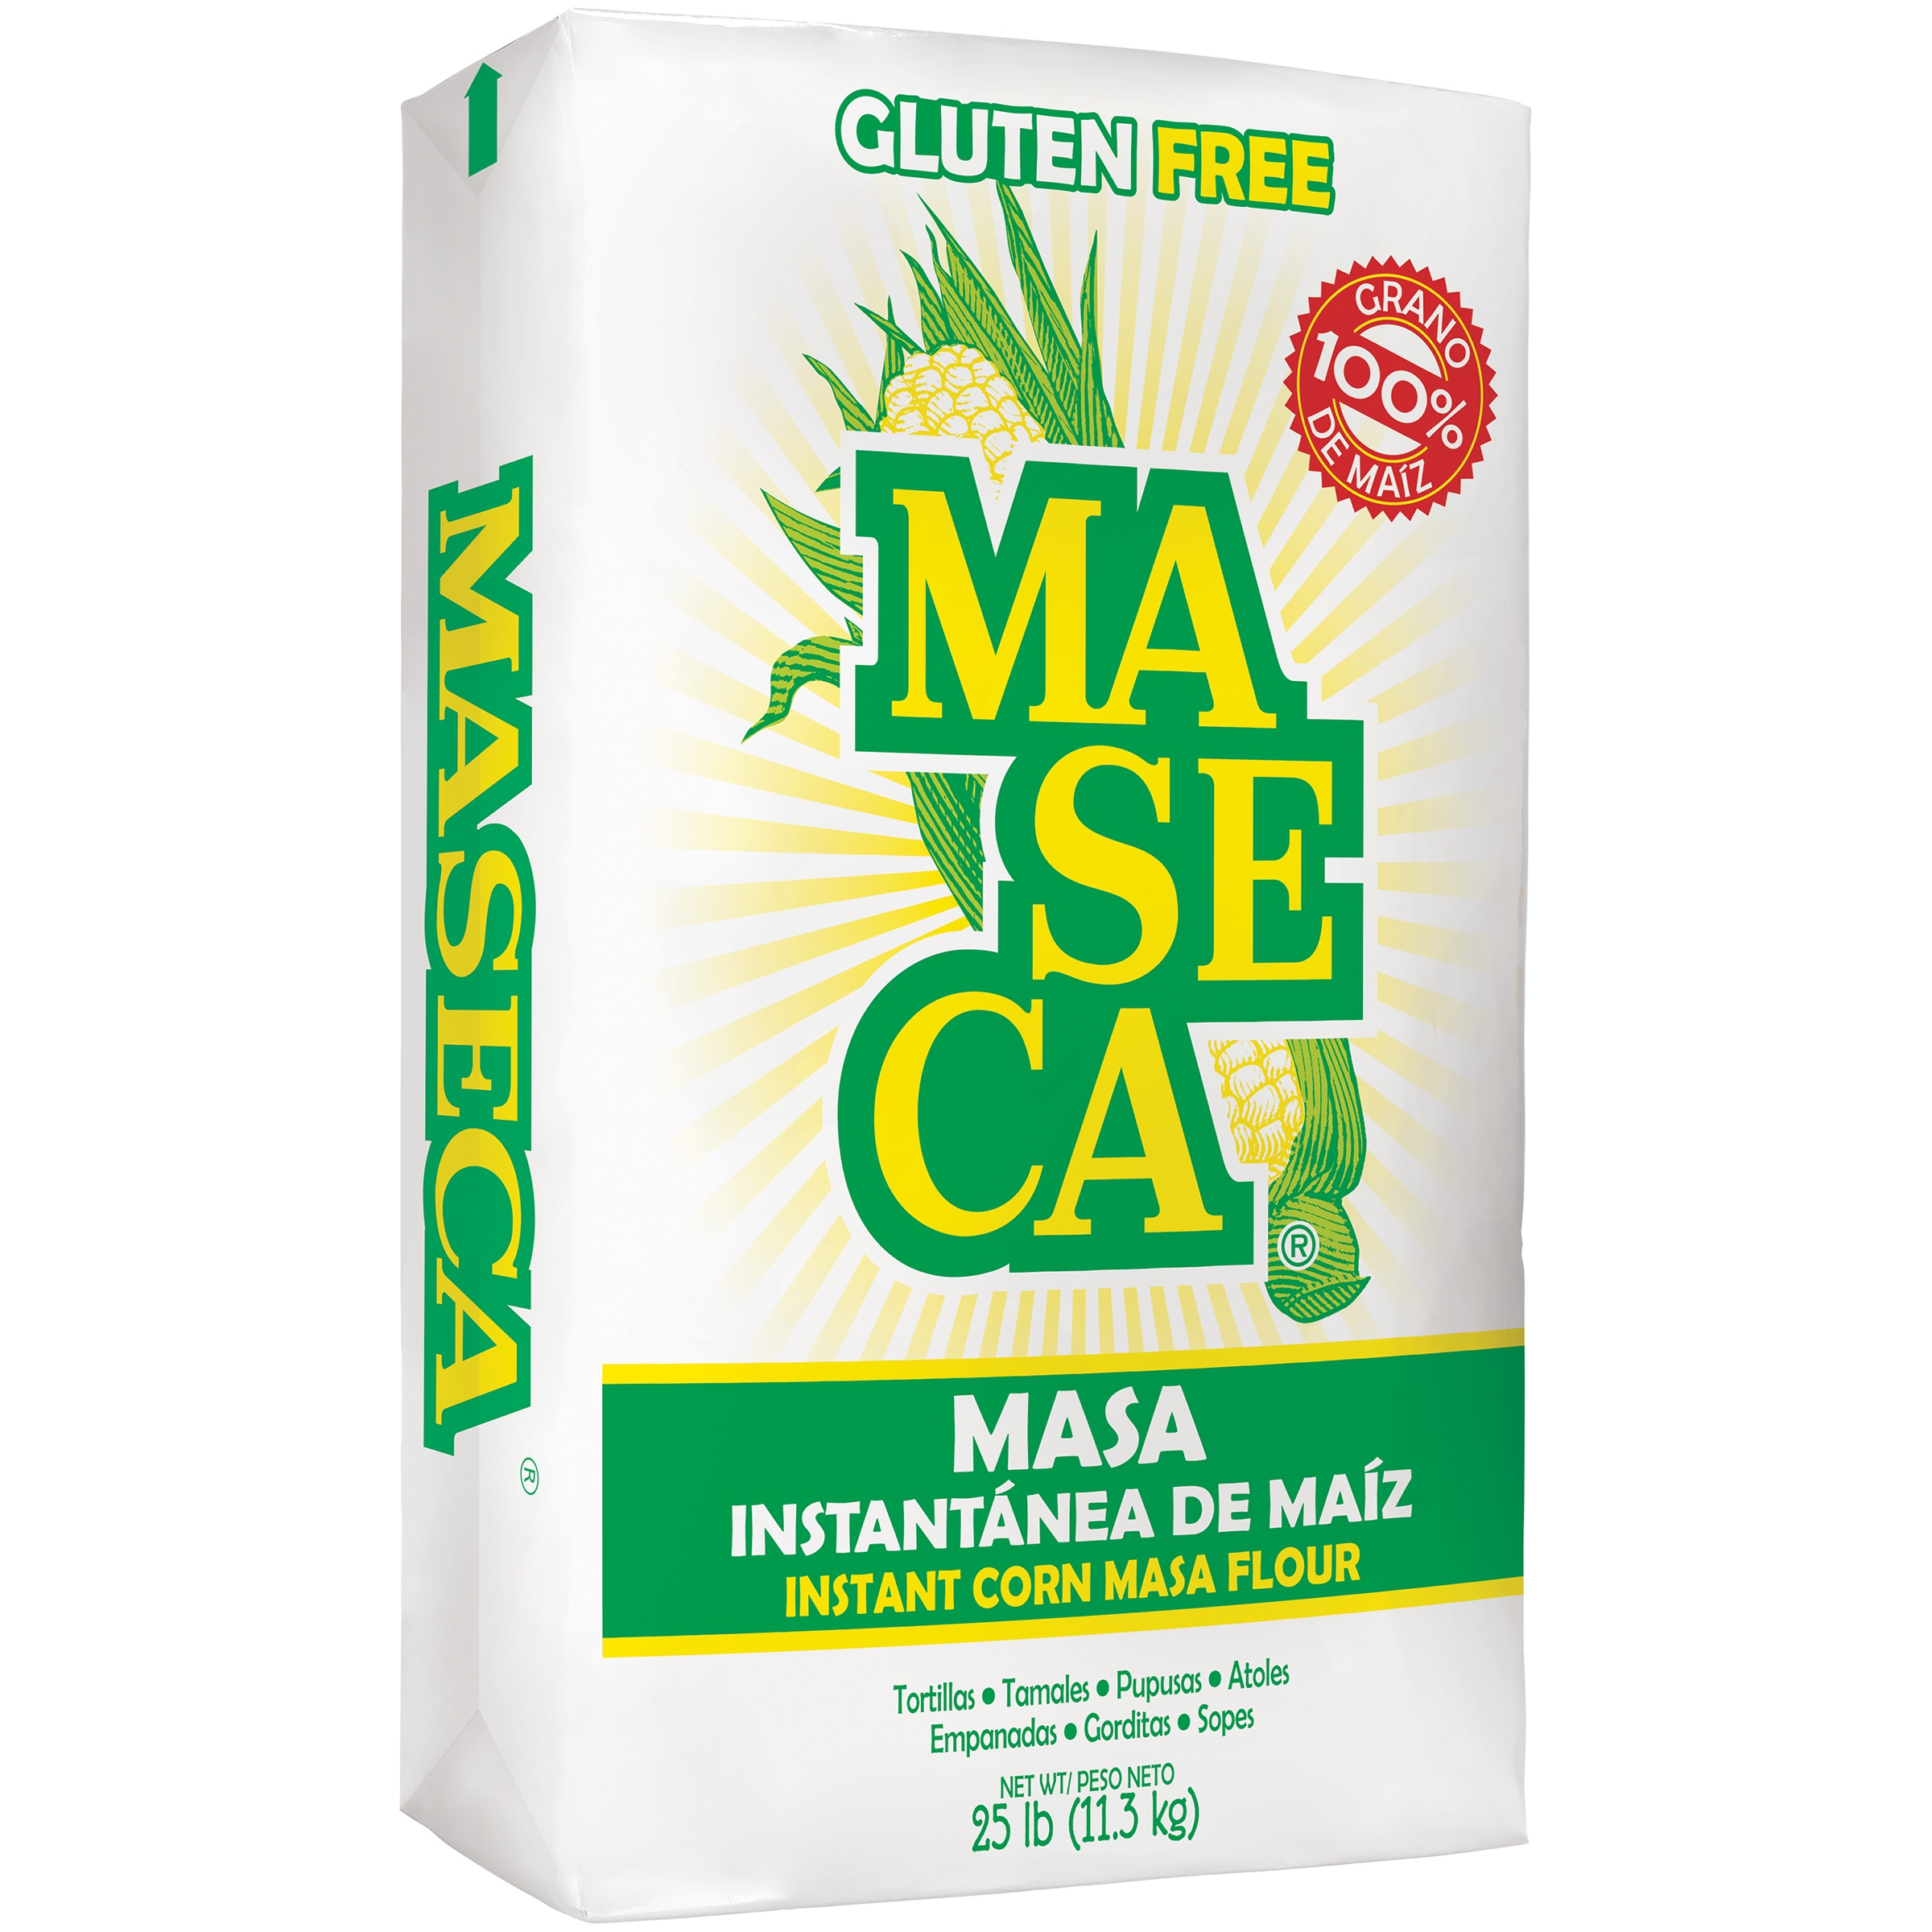 Gluten free masa